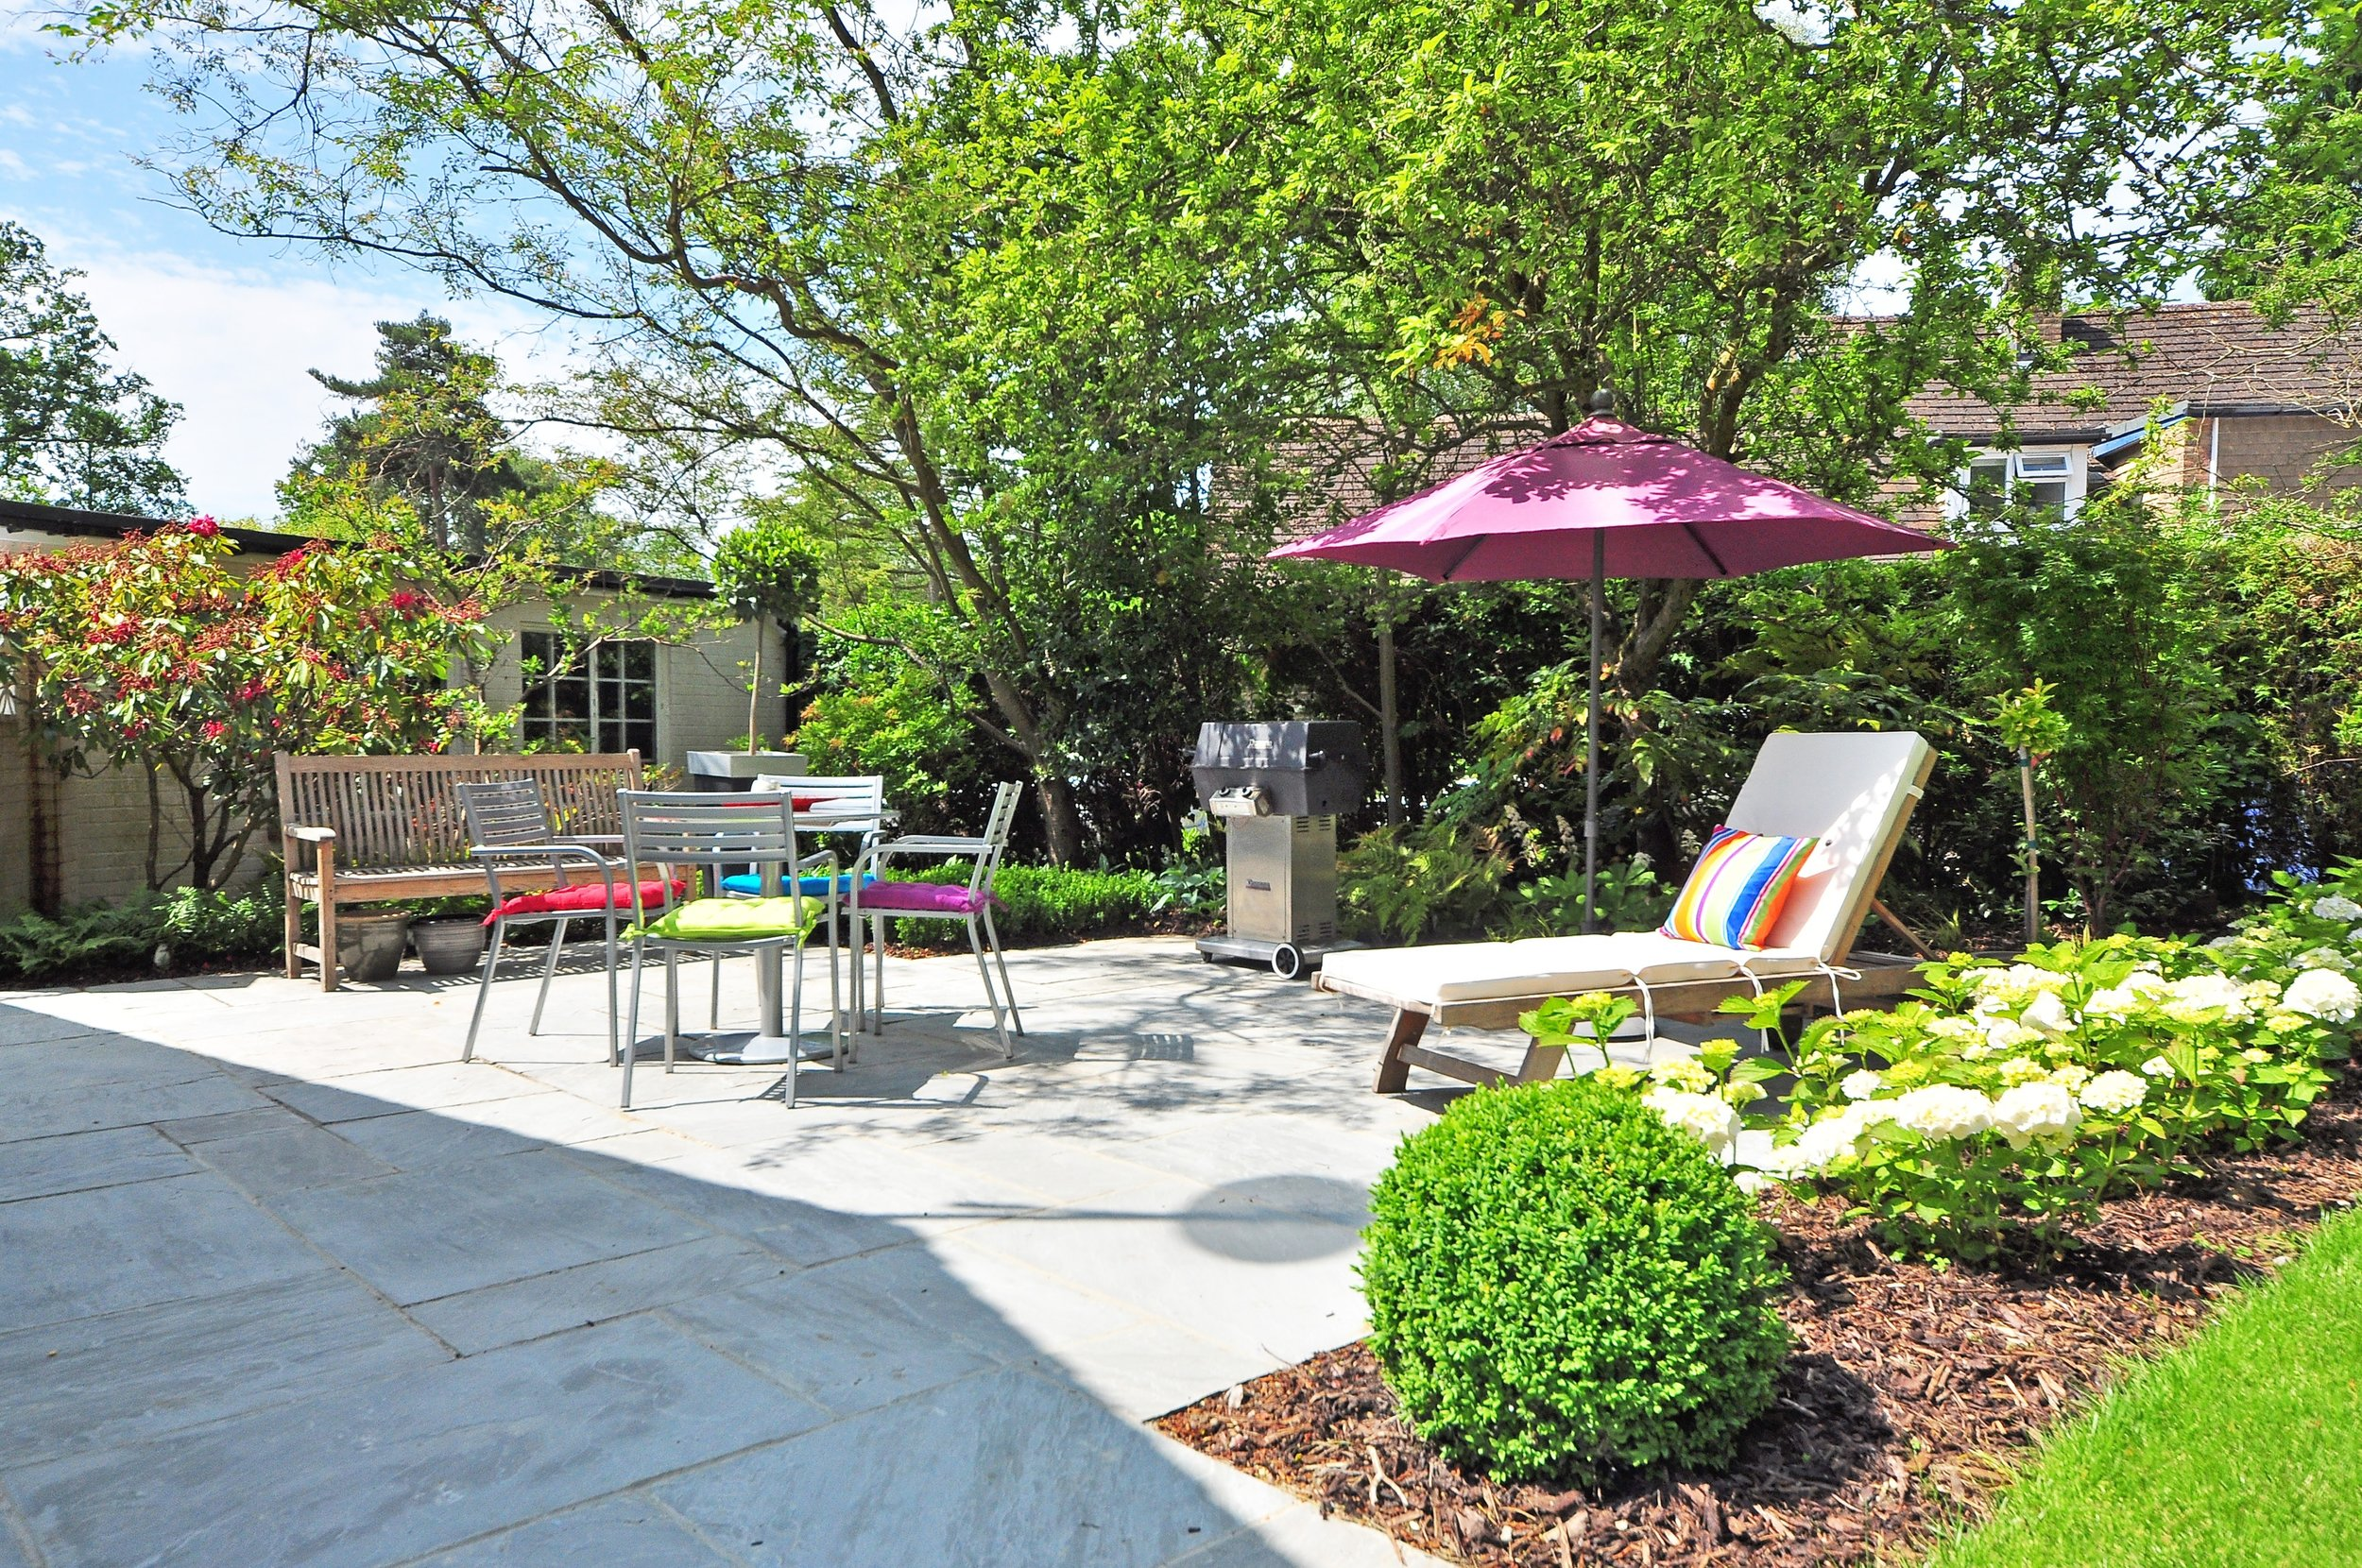 backyard-bench-daylight-210531.jpg